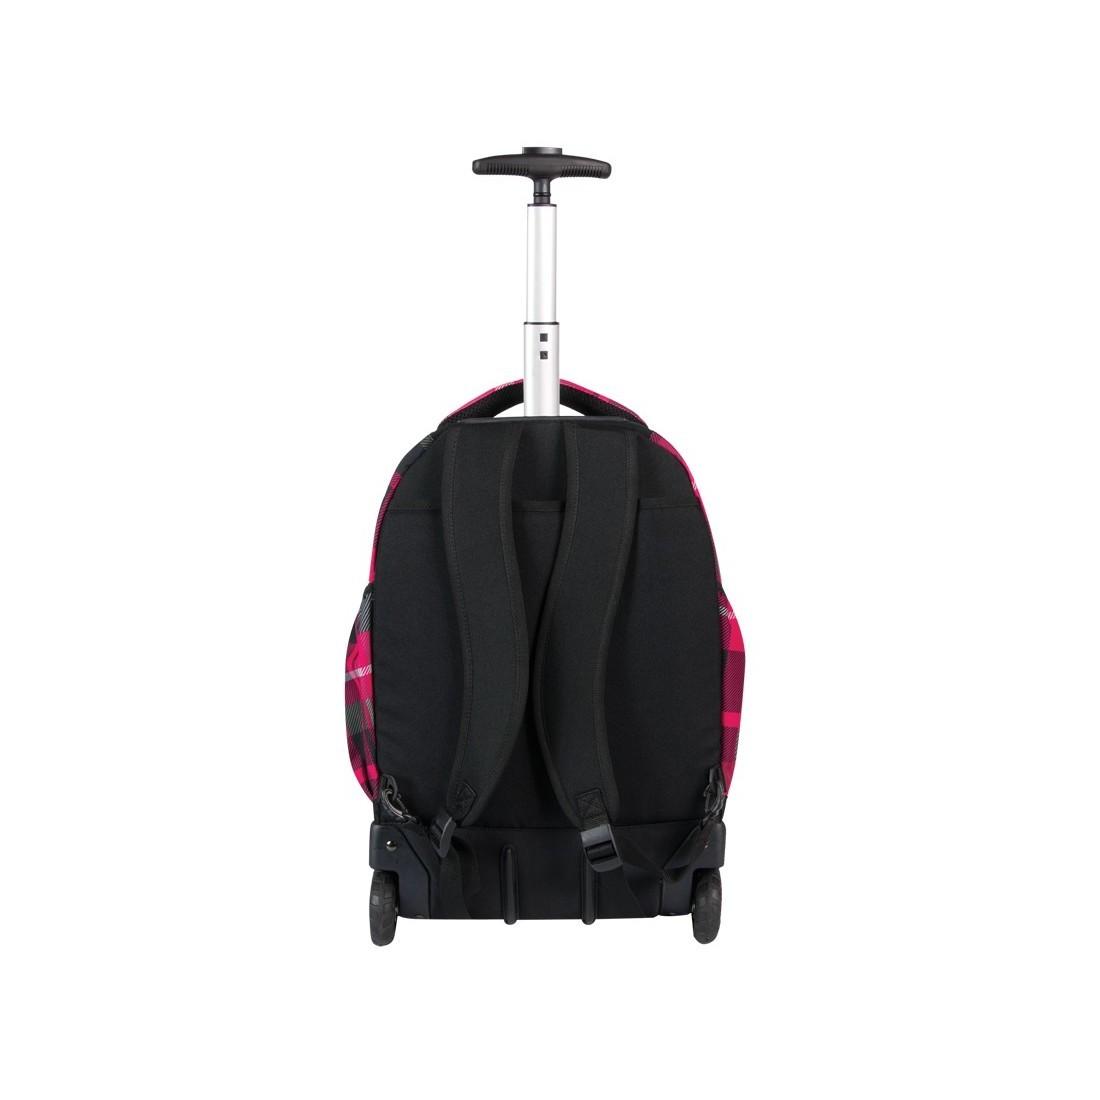 Plecak CoolPack na kółkach dla dziewczyny w kratkę - RAPID PASTEL CHECK CP 123 - plecak-tornister.pl